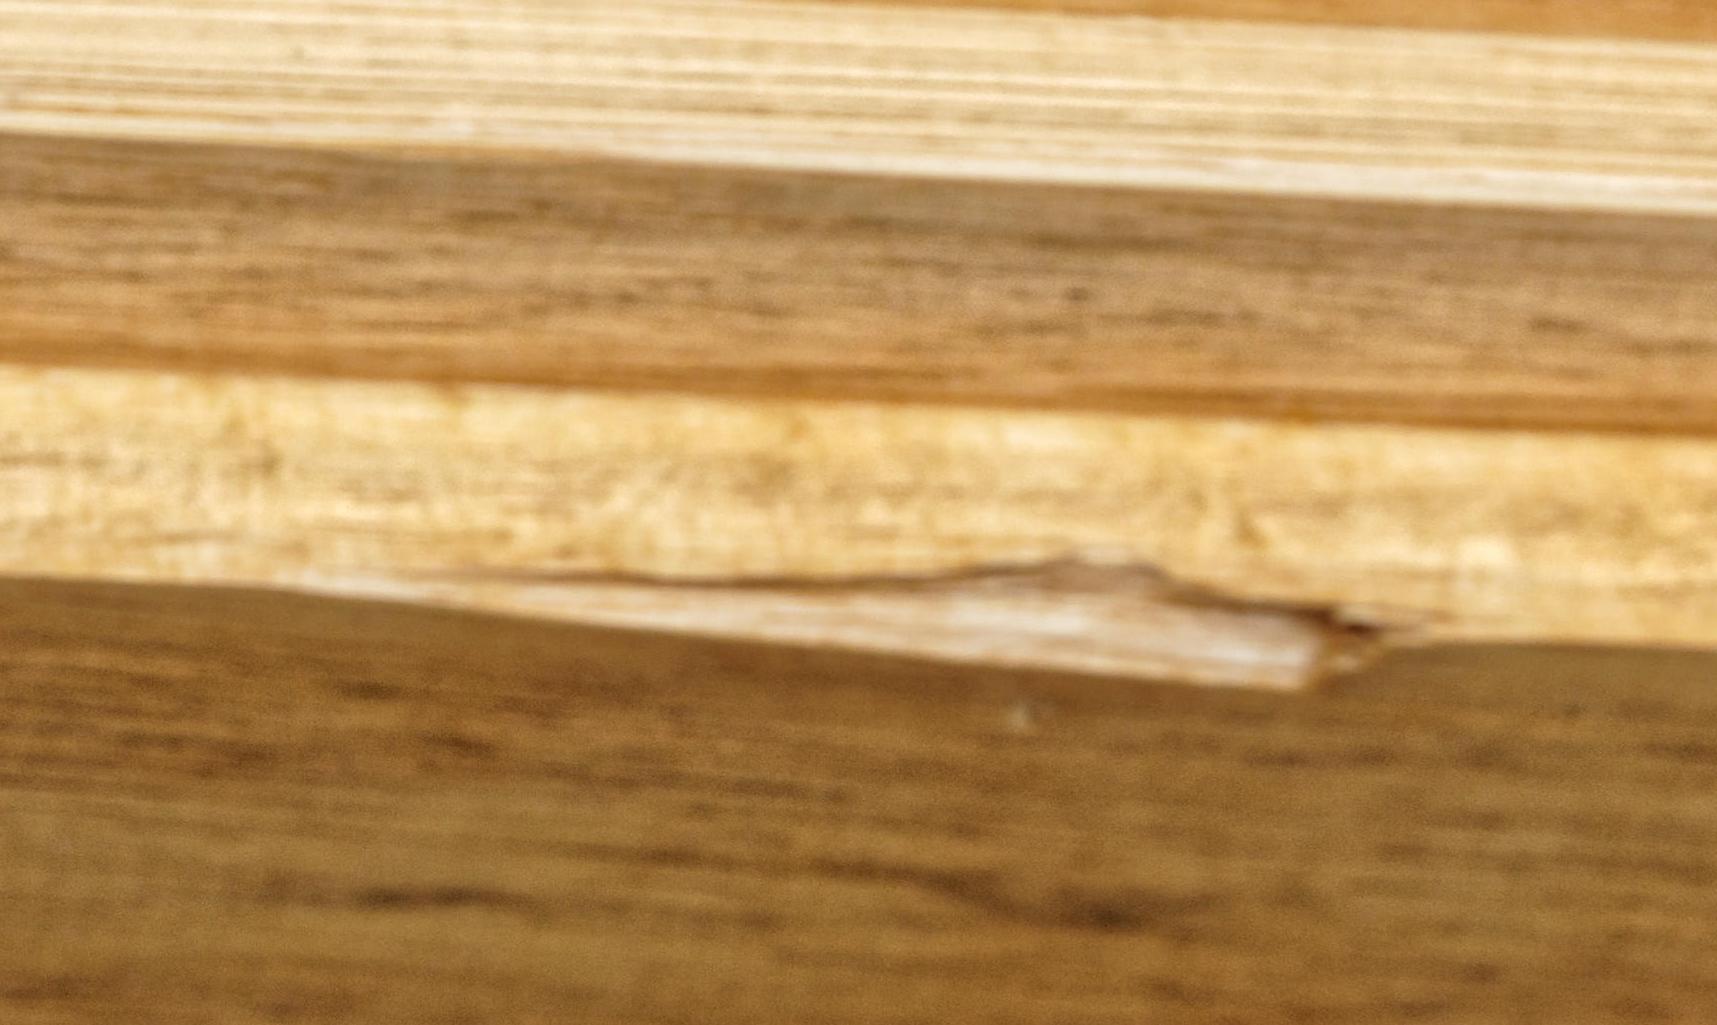 Door-frame-detail.jpeg